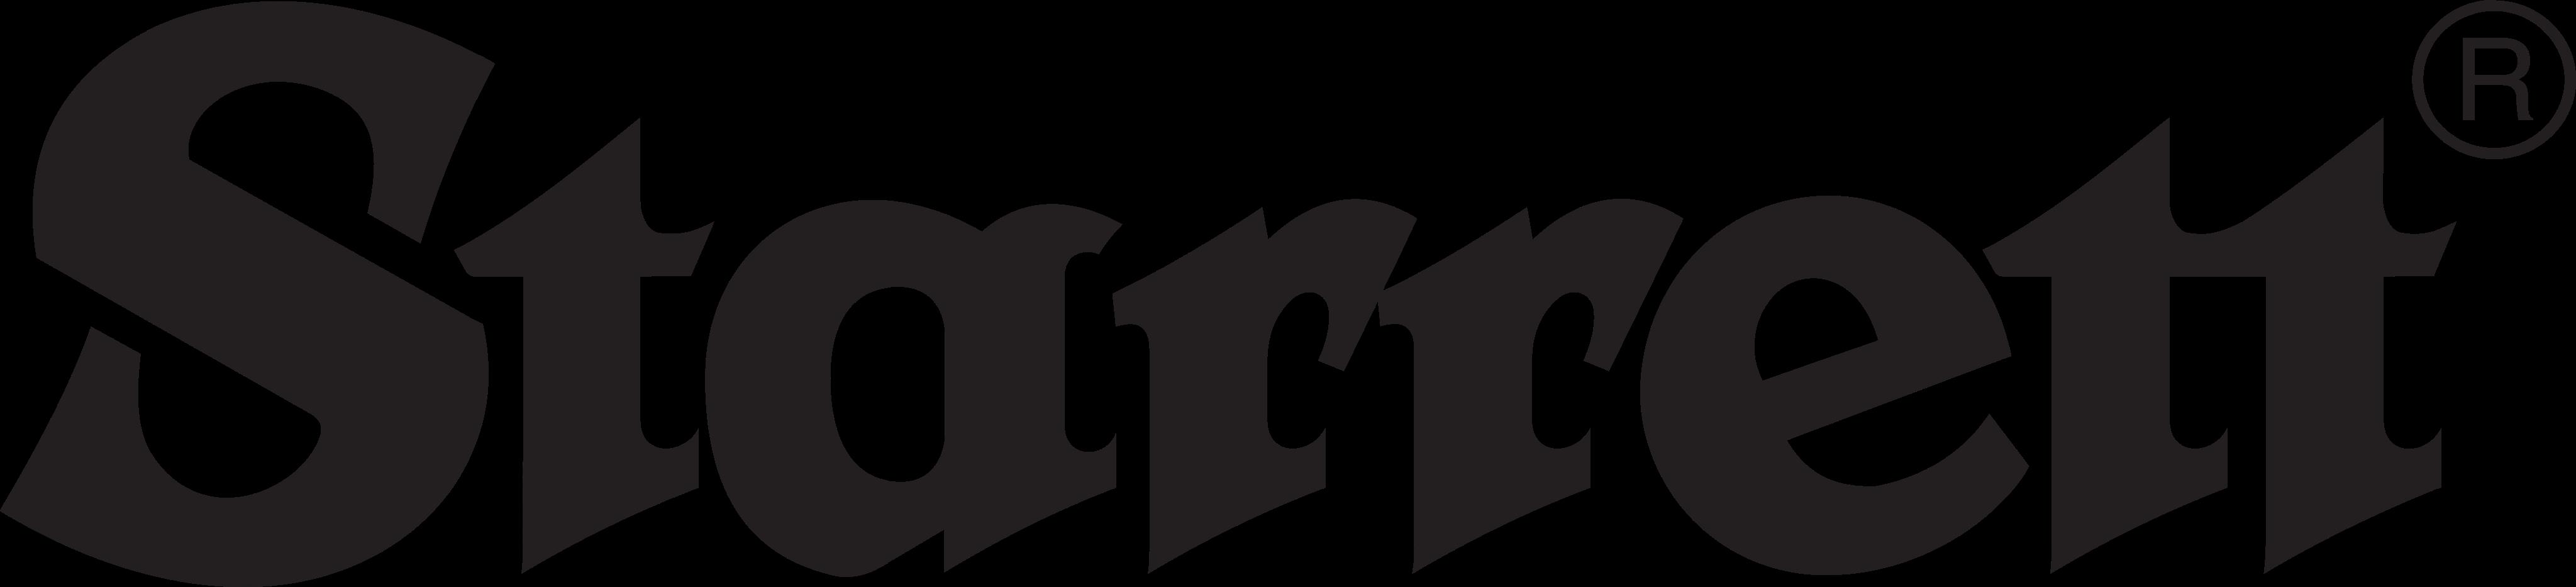 starrett logo 3 - Starrett Logo